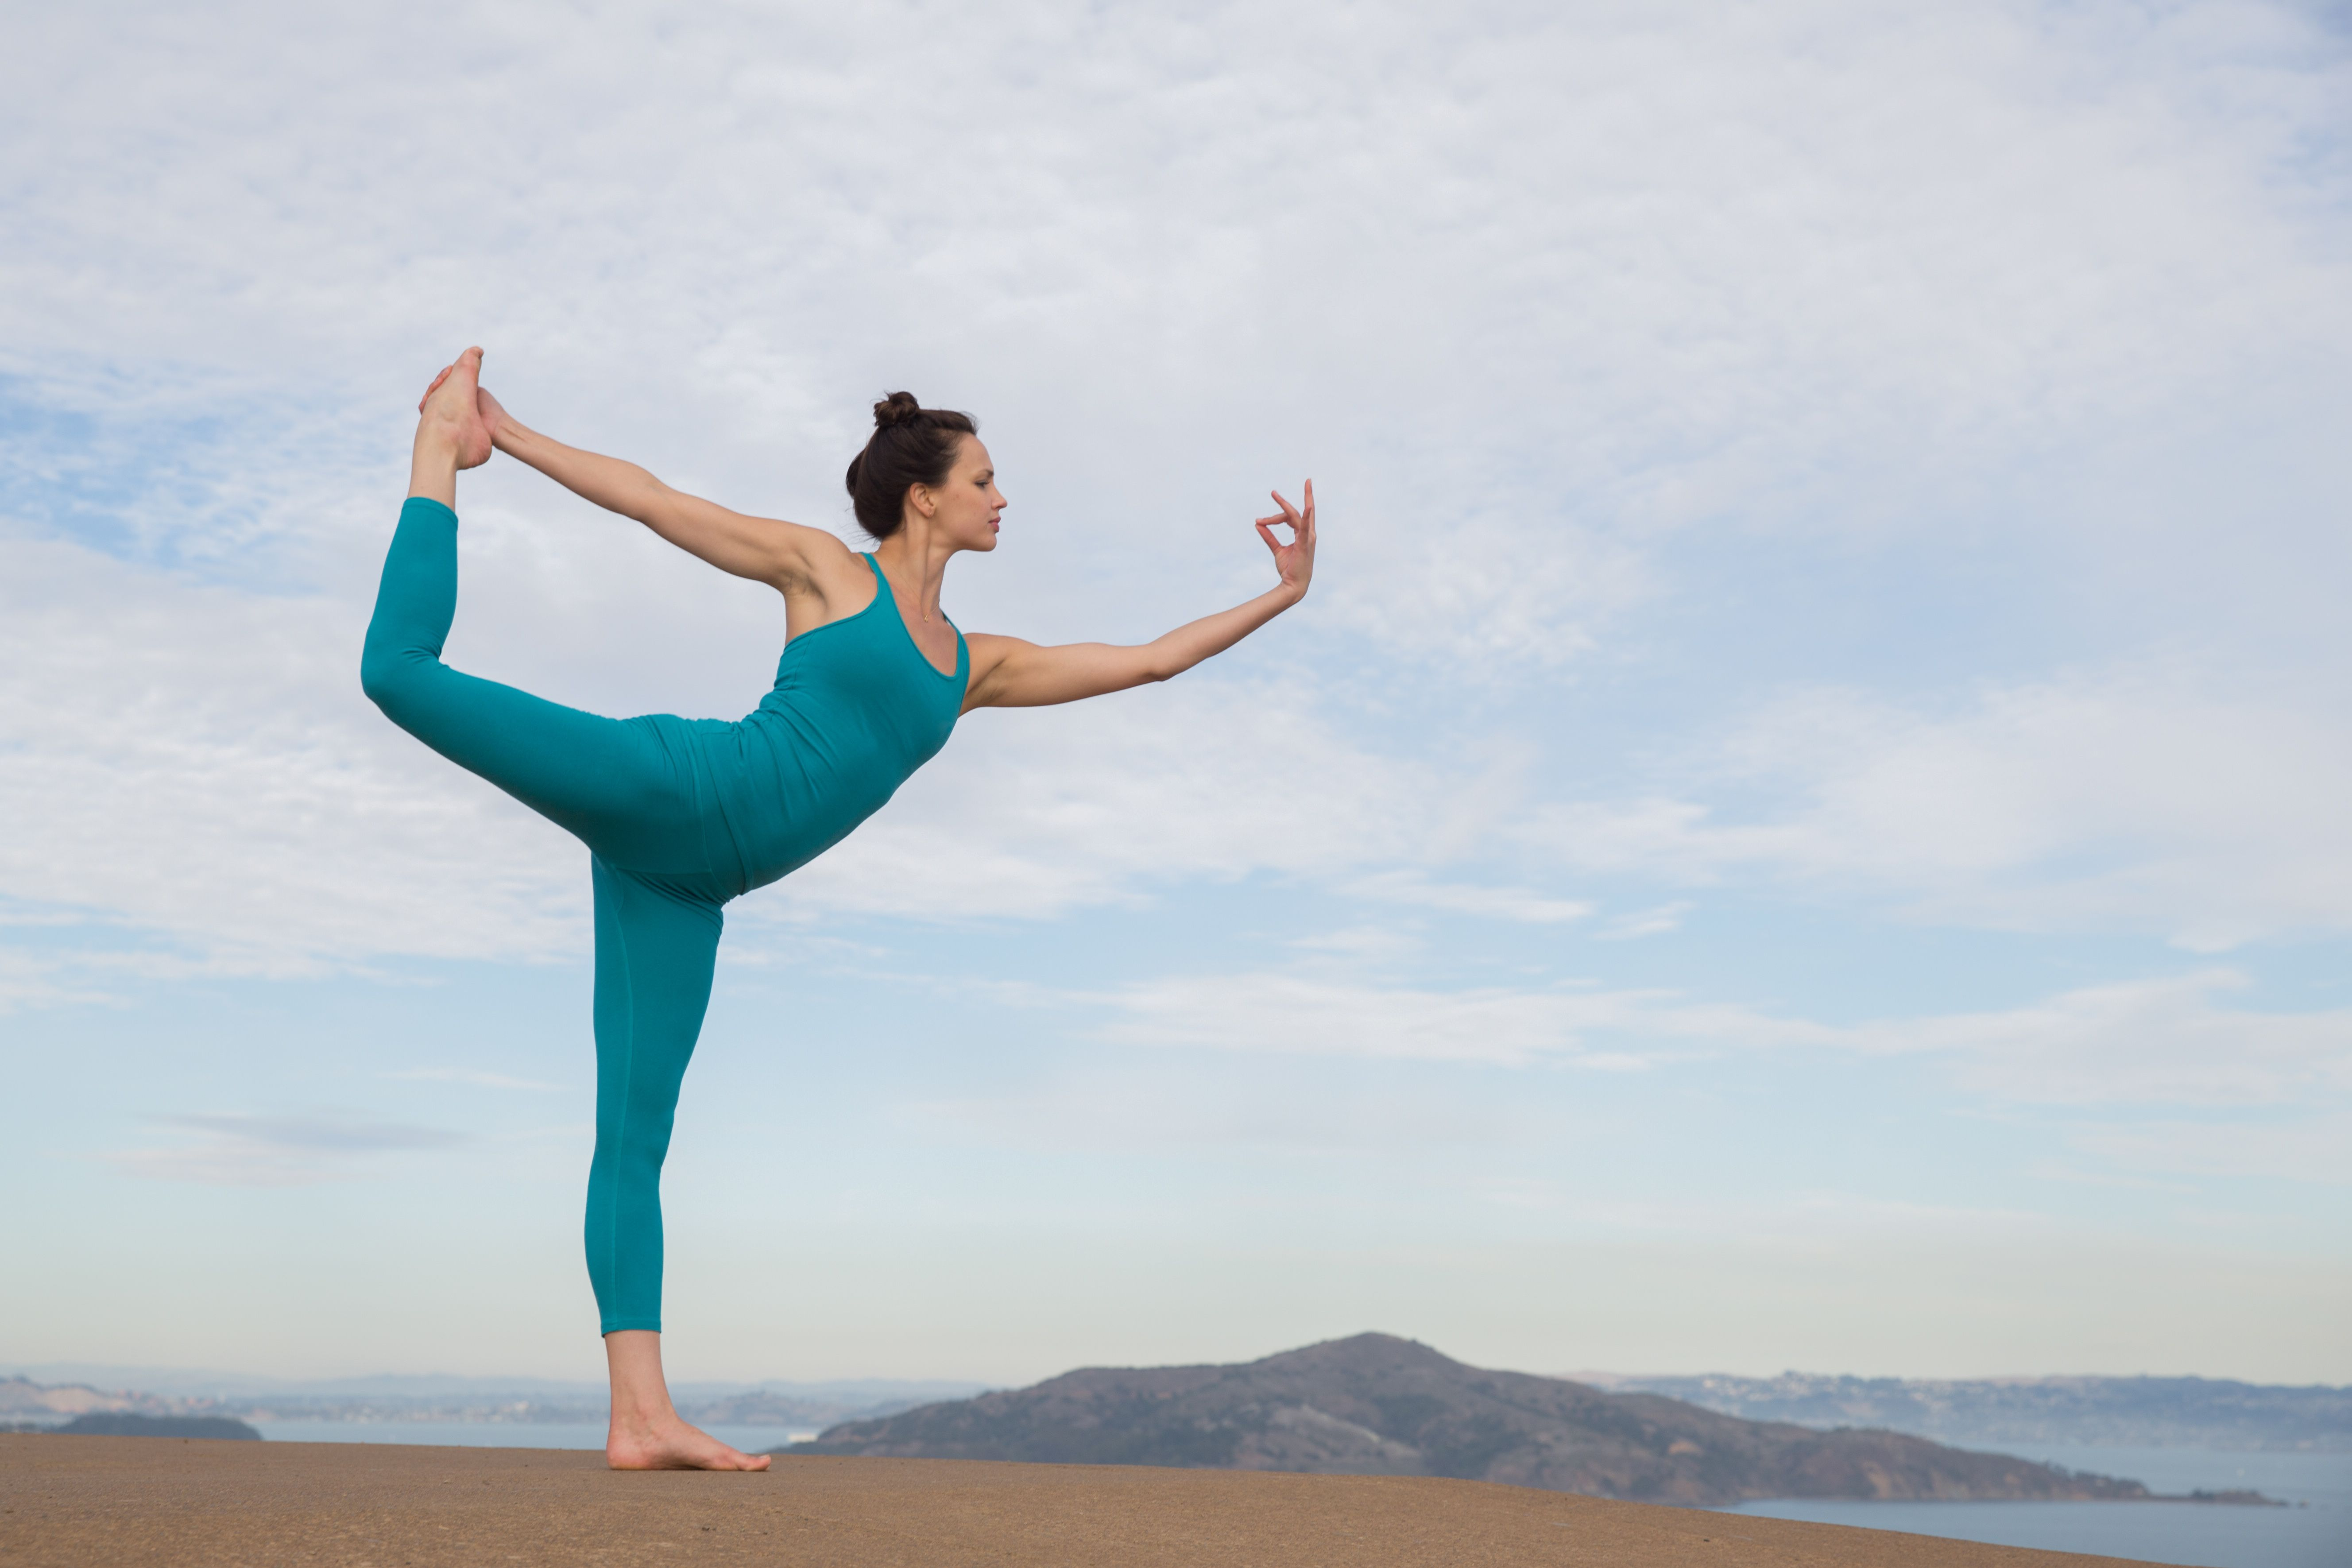 Samantha Klanac Campanile Yoga Sanfrancisco Organic Yoga Clothes Organic Cotton Clothing Yoga Clothes